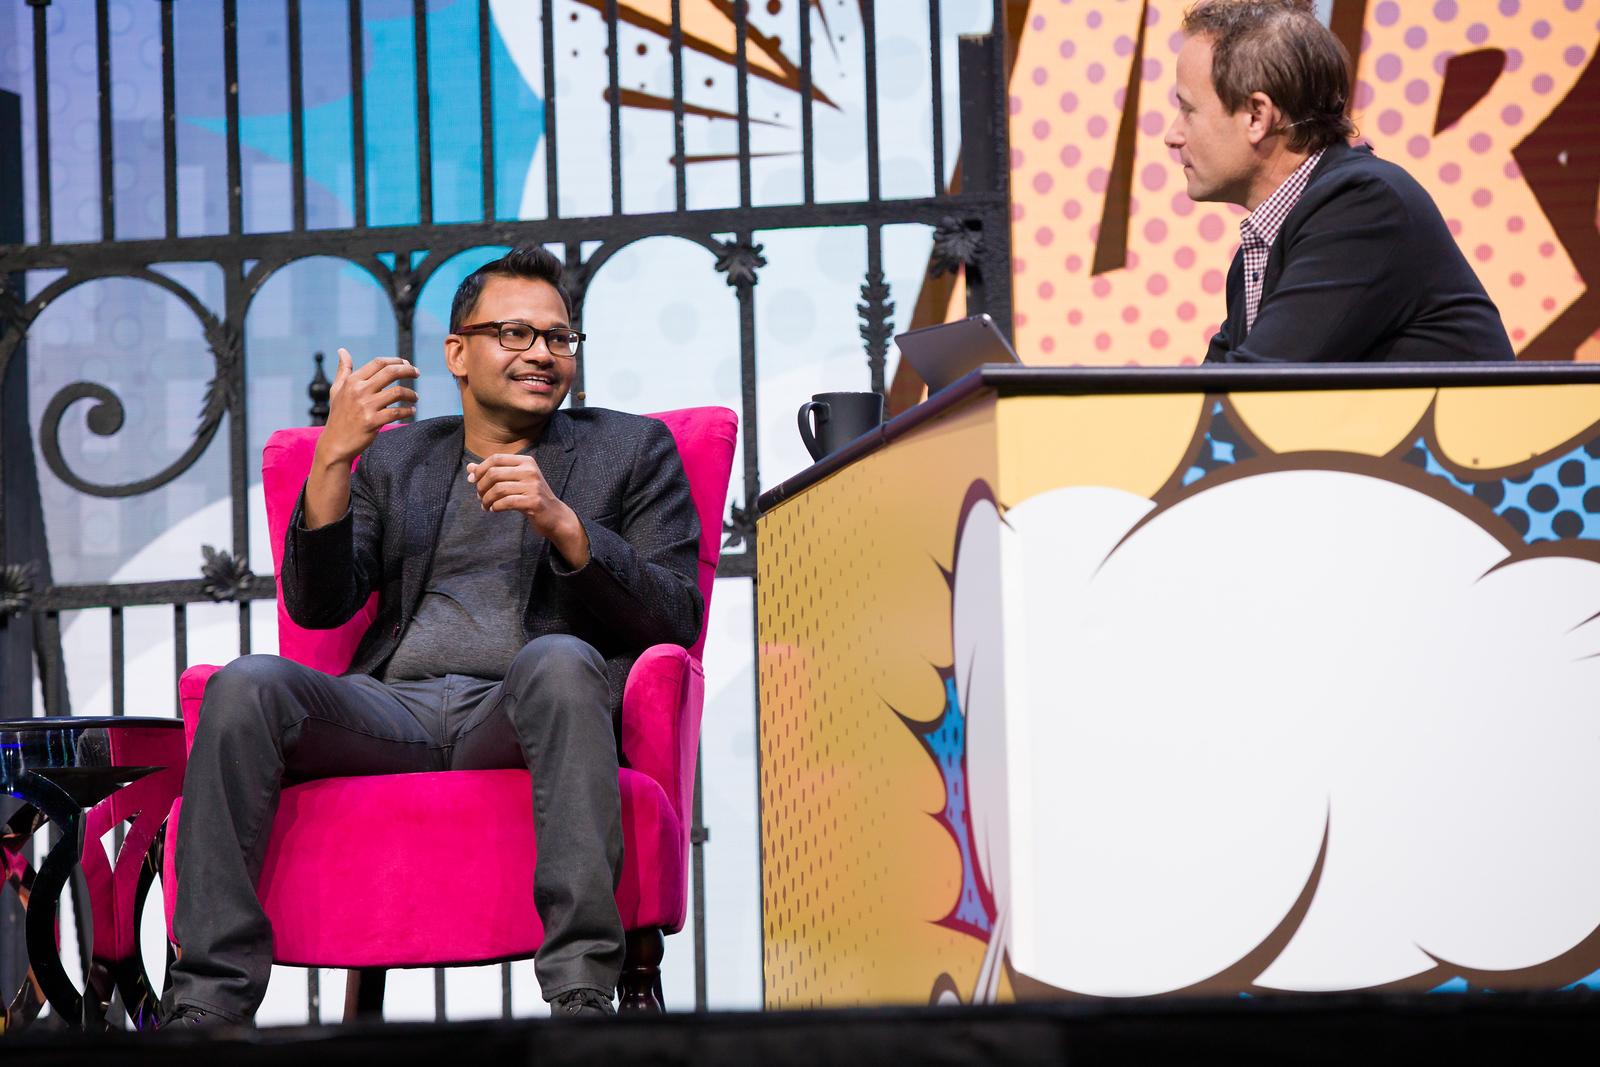 The AppDynamics Story: From Idea to $3.7B...The Journey Continues Jyoti Bansal FOUNDER & CHAIRMAN / APPDYNAMICS Jason Lemkin FOUNDER / SAASTR